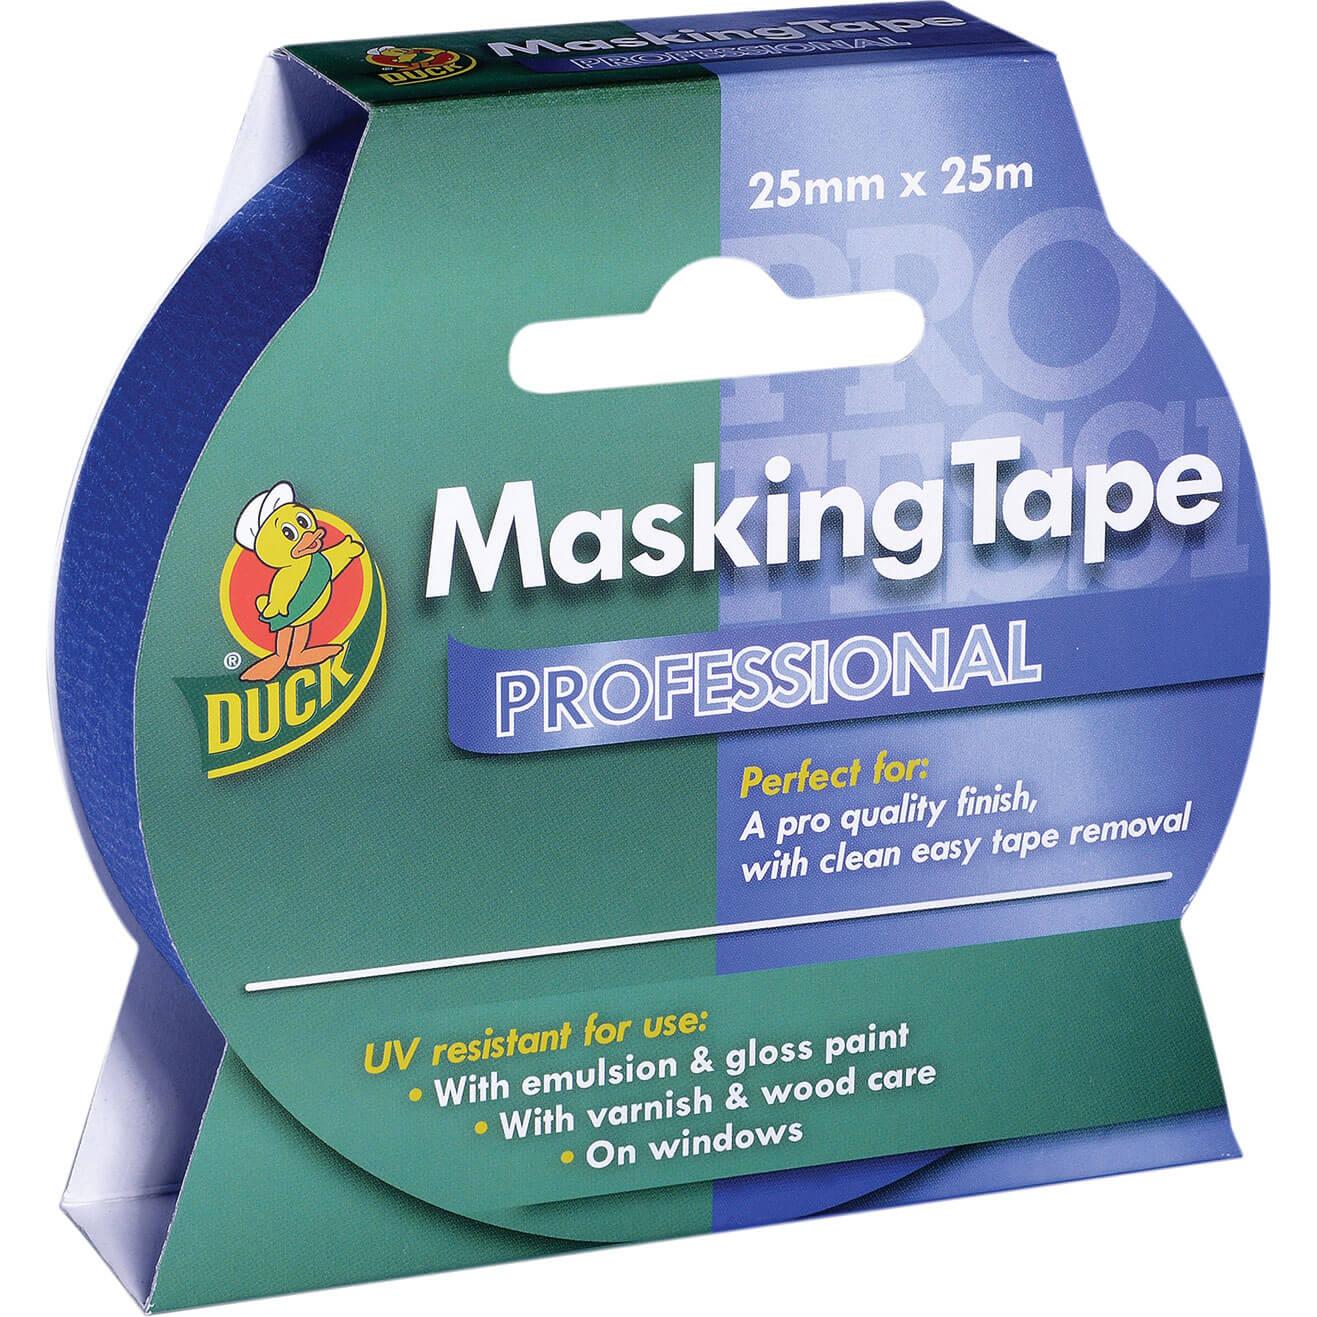 Duck Tape Professional Masking Tape Blue 25mm 25m